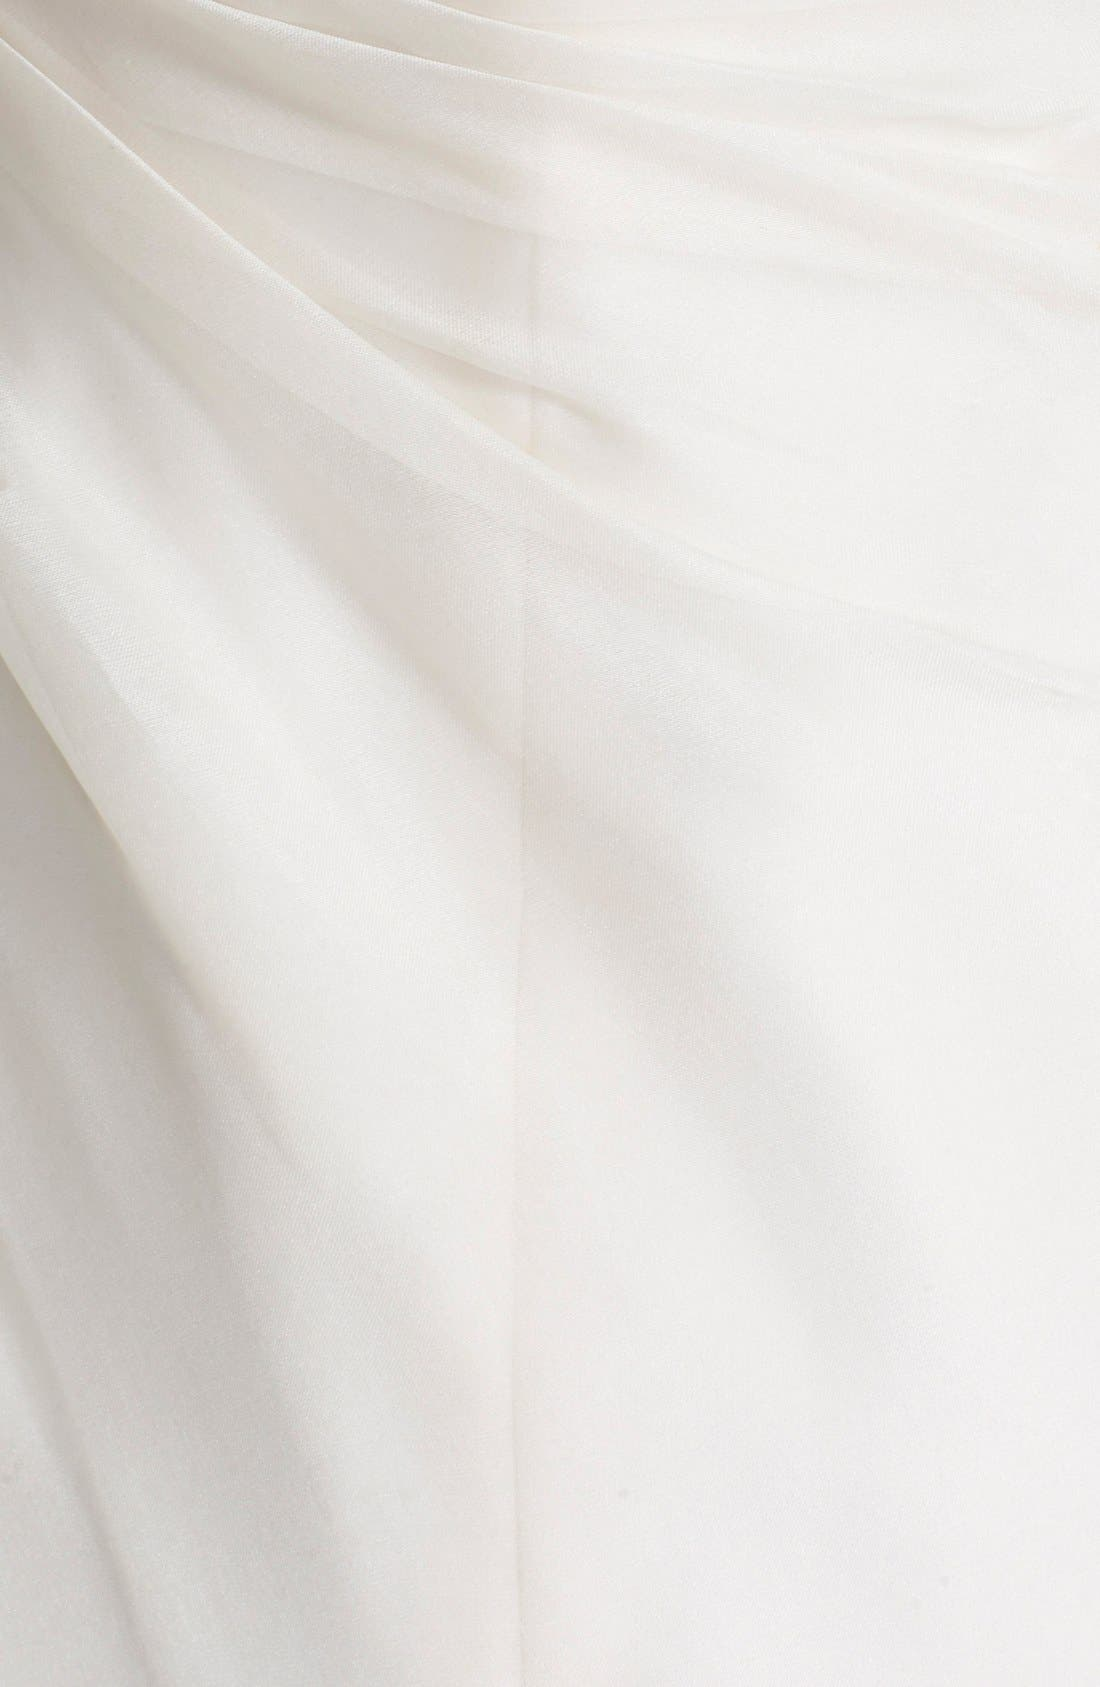 Alternate Image 3  - BLISS Monique Lhuillier Strapless Silk Organza Mermaid Wedding Dress (In Stores Only)